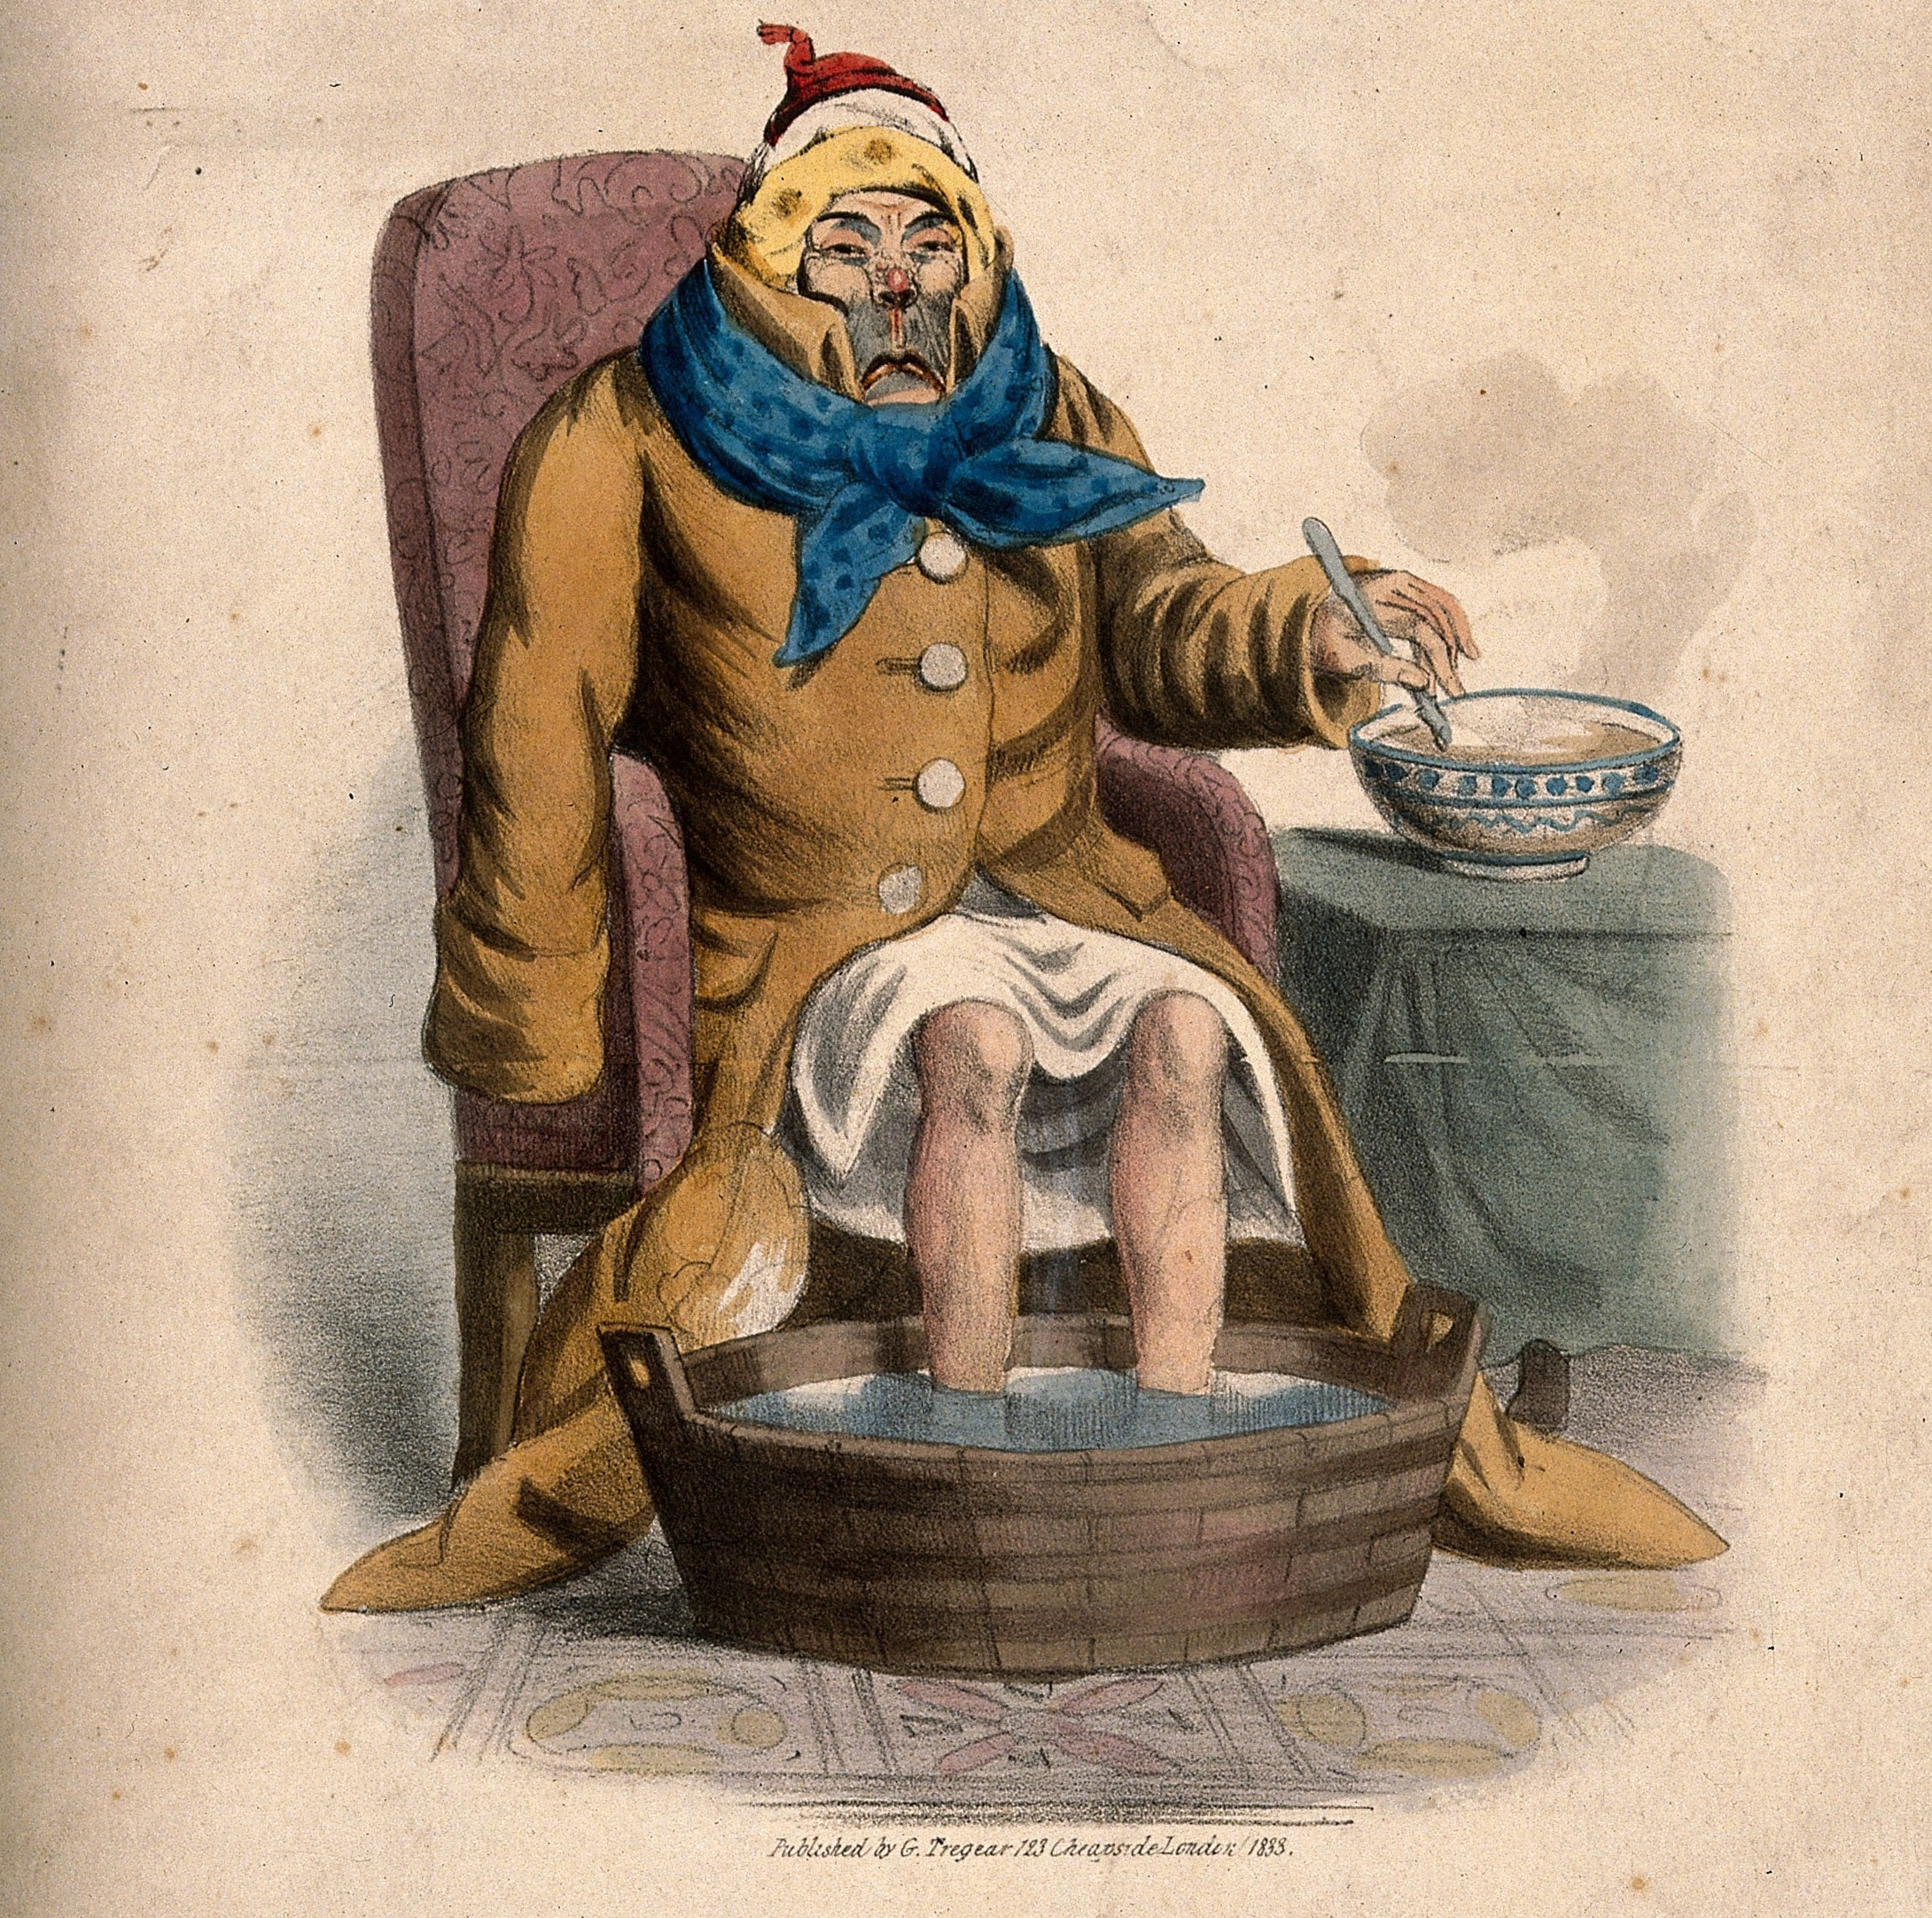 2_ke_p_a_sick_man_with_a_cold_coloured_lithograph_1833.jpg